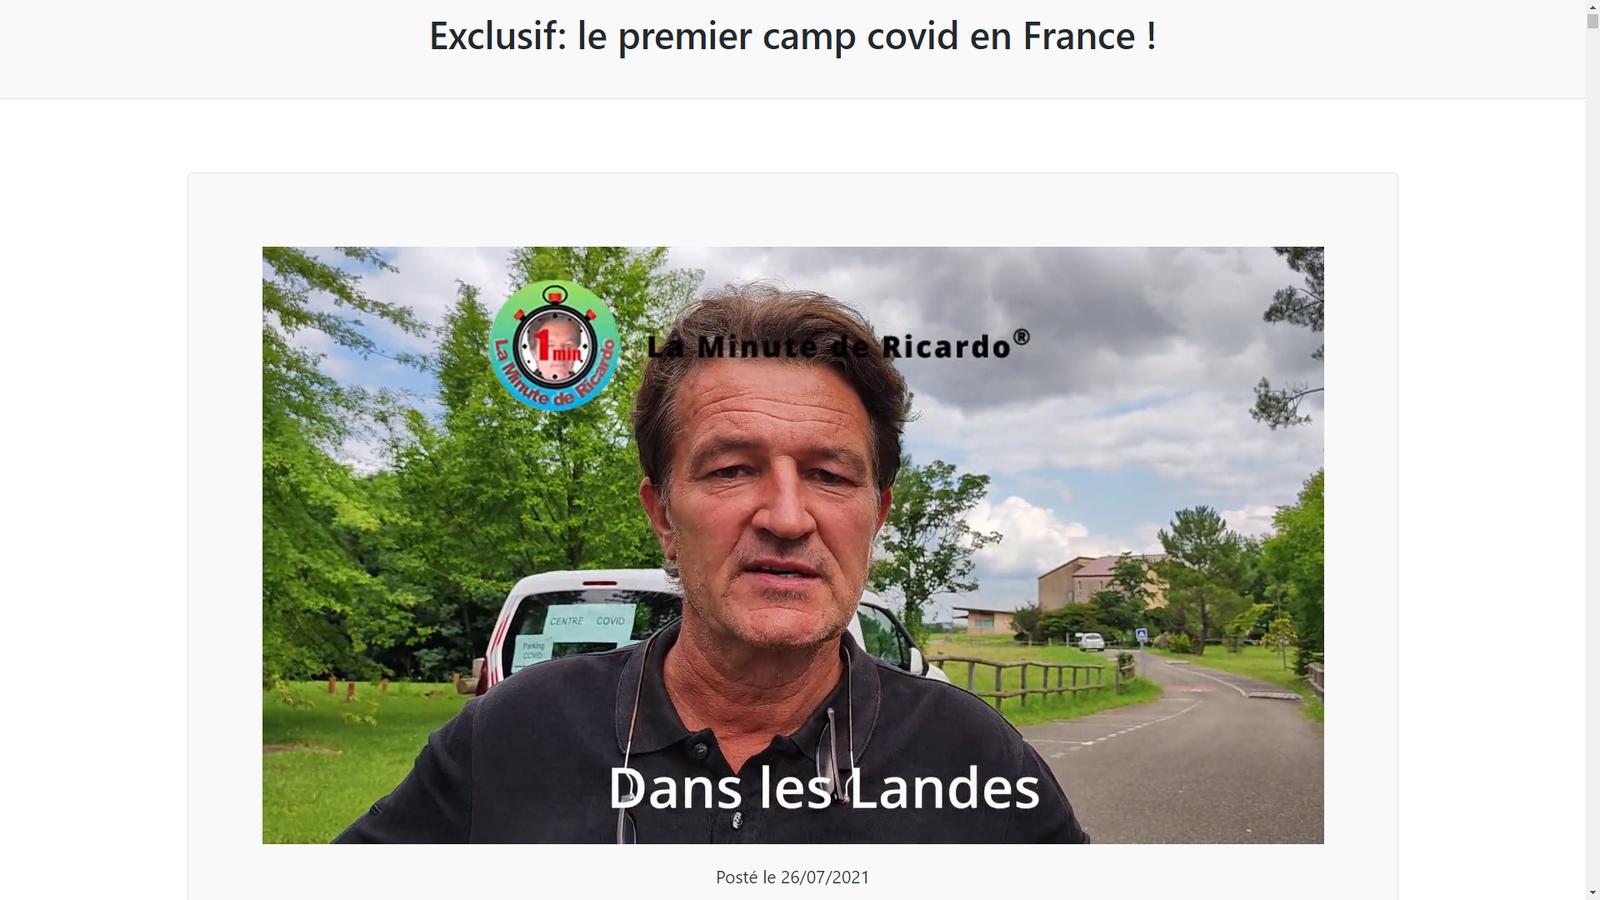 Source: https://www.laminutedericardo.com/LMDR/exclusif-le-premier-camp-covid-en-france/